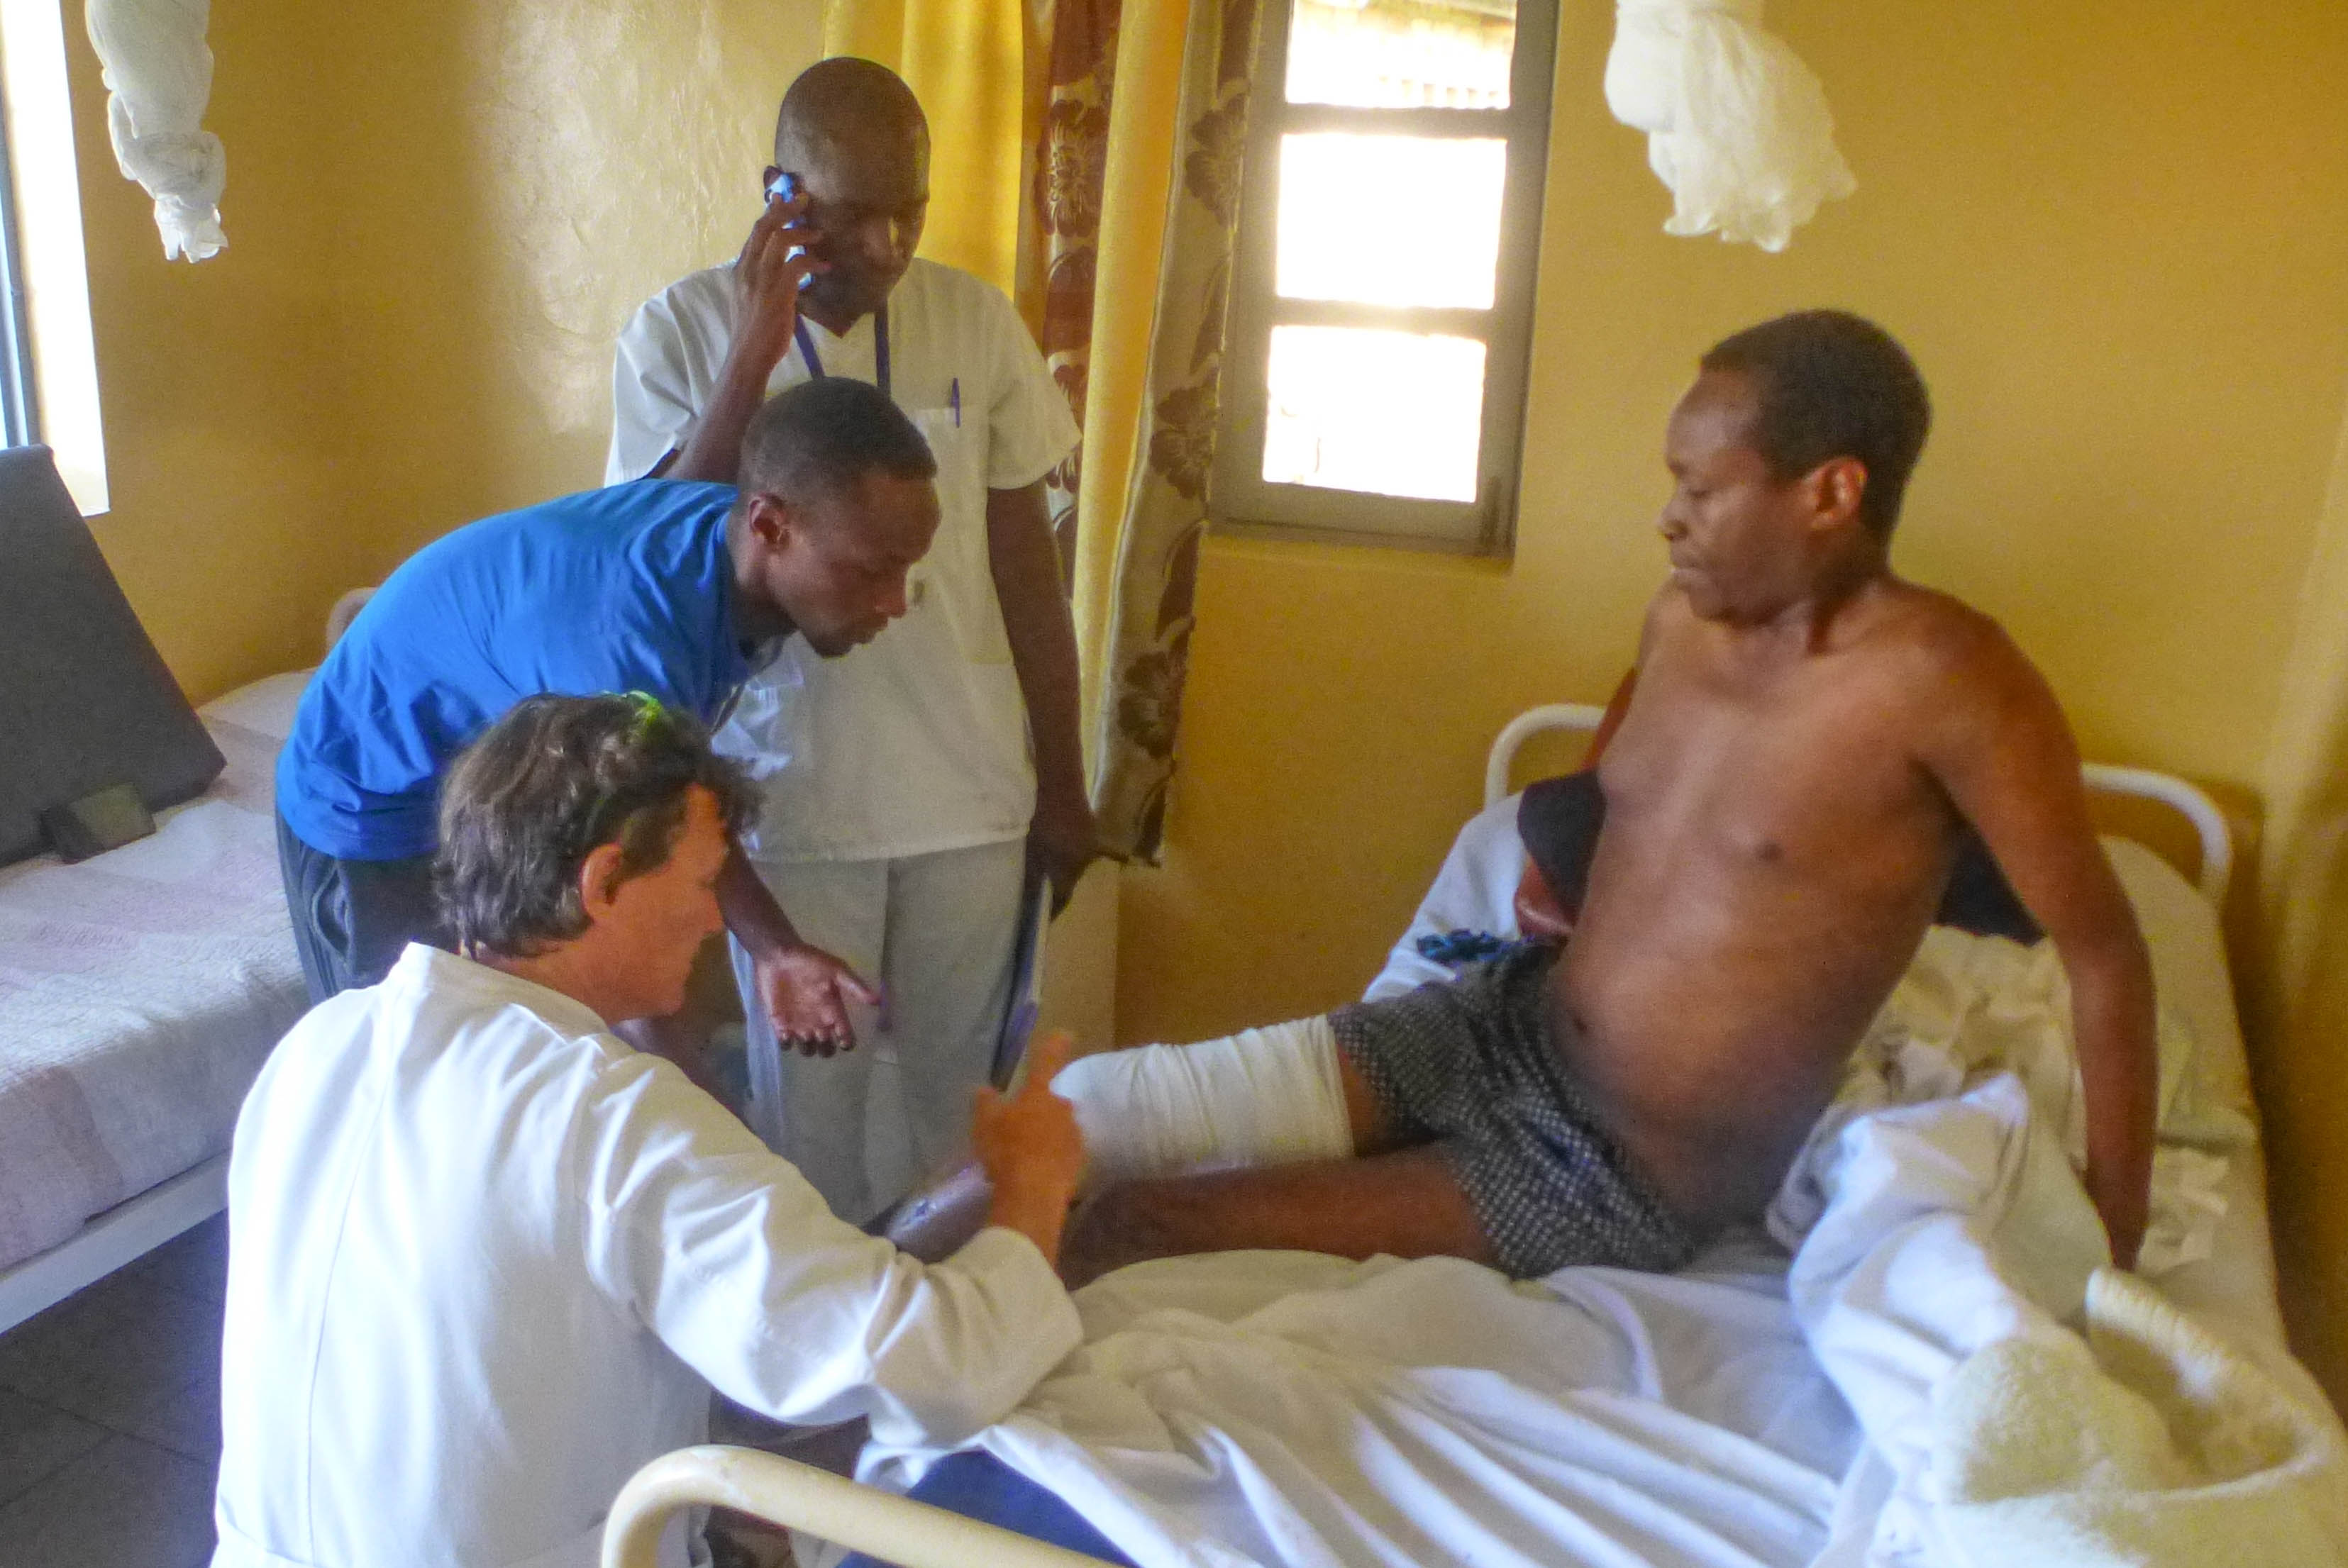 Reisebericht-Kibogora-Hospital-2018-27